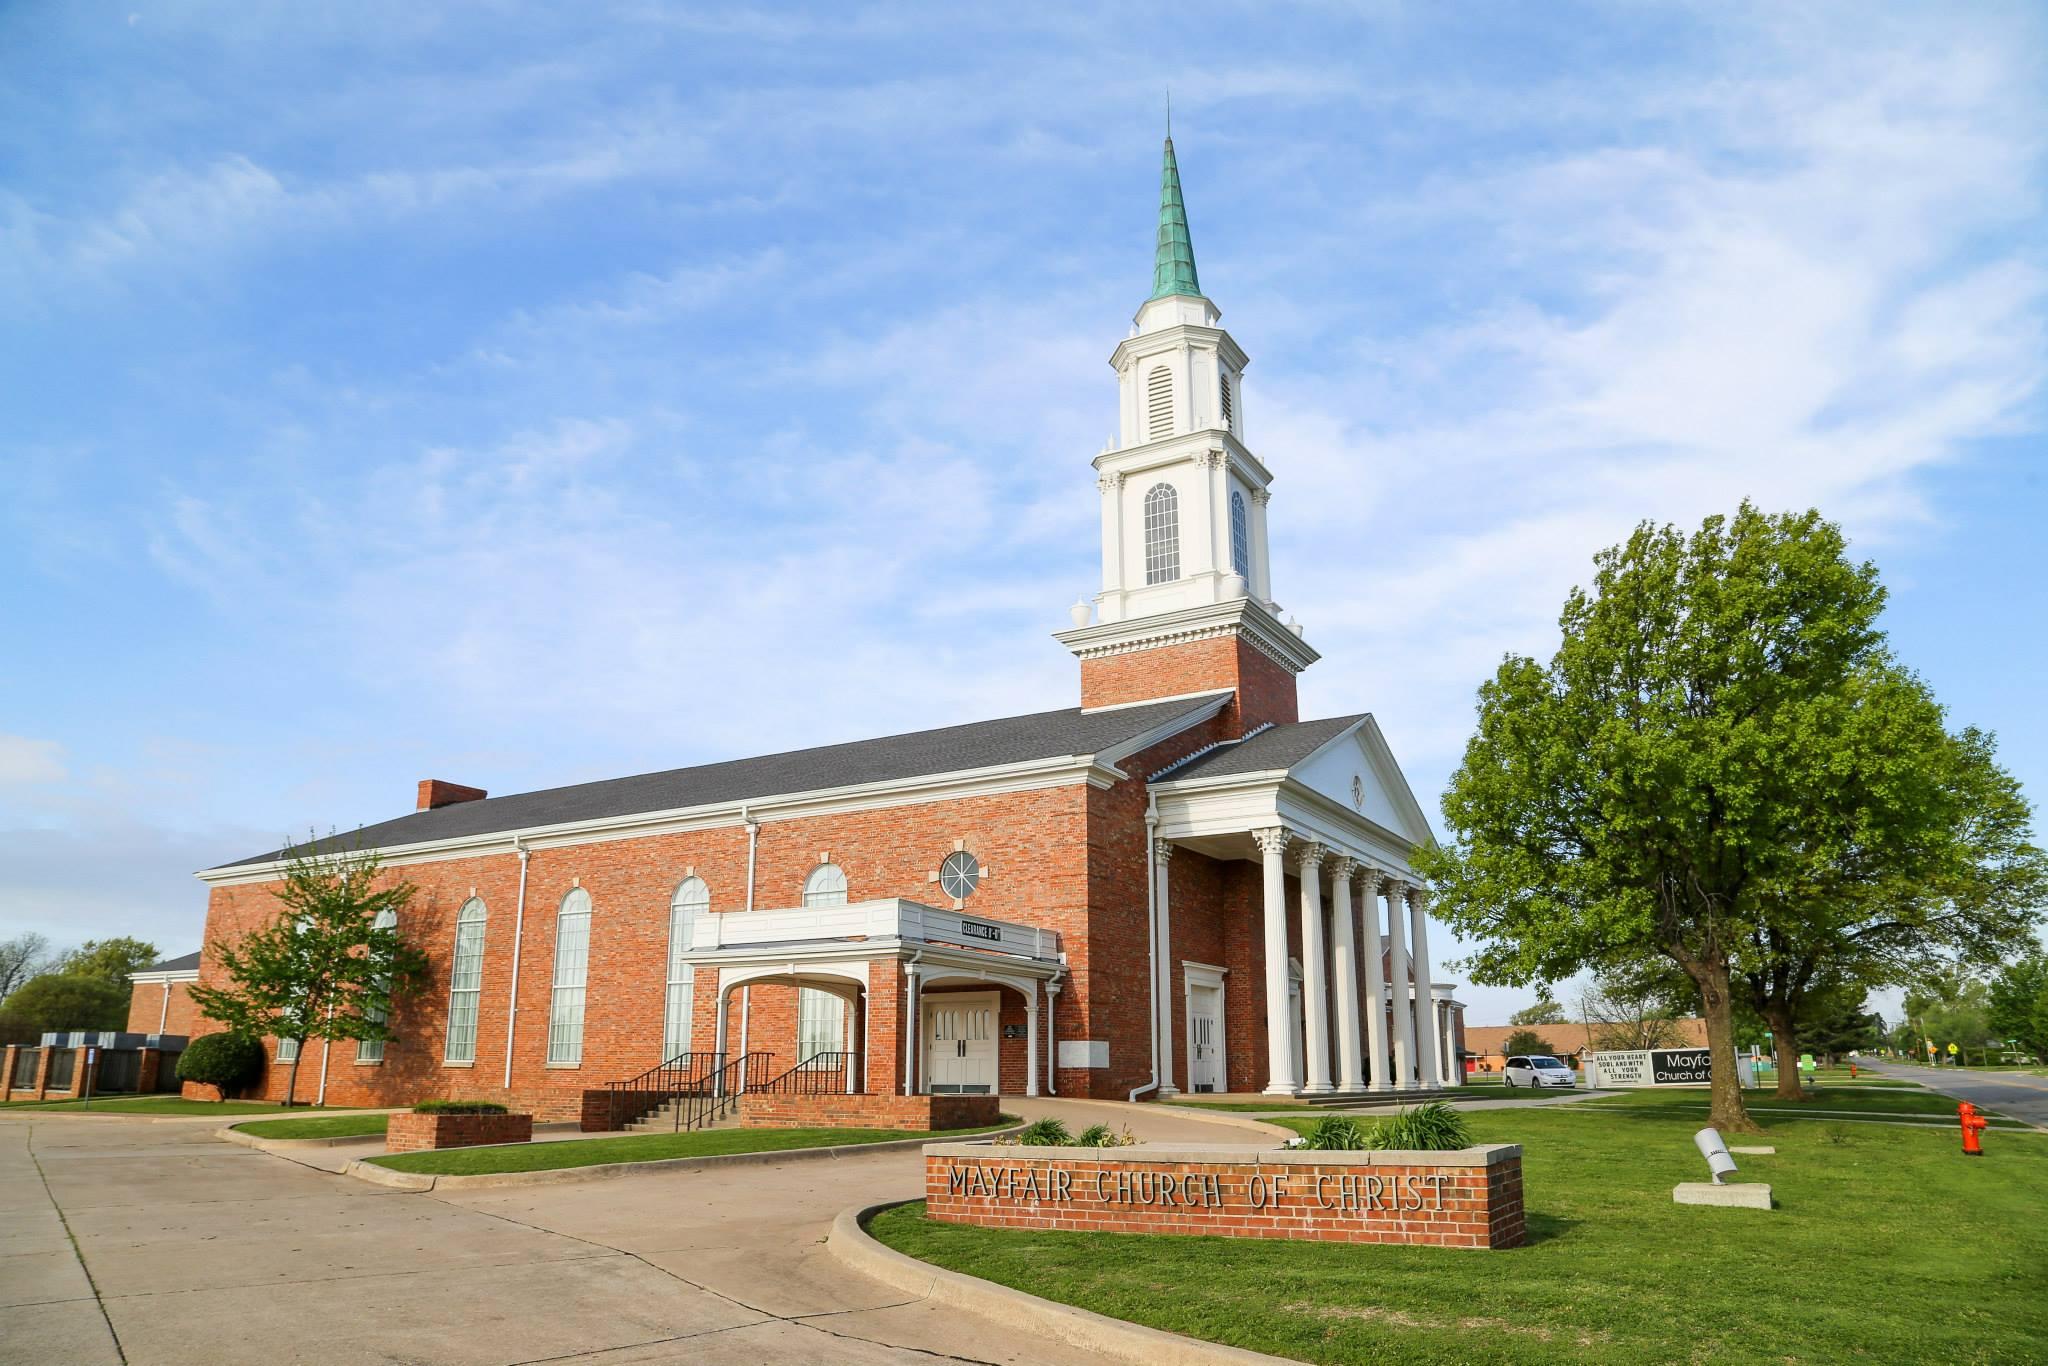 Mayfair Church of Christ